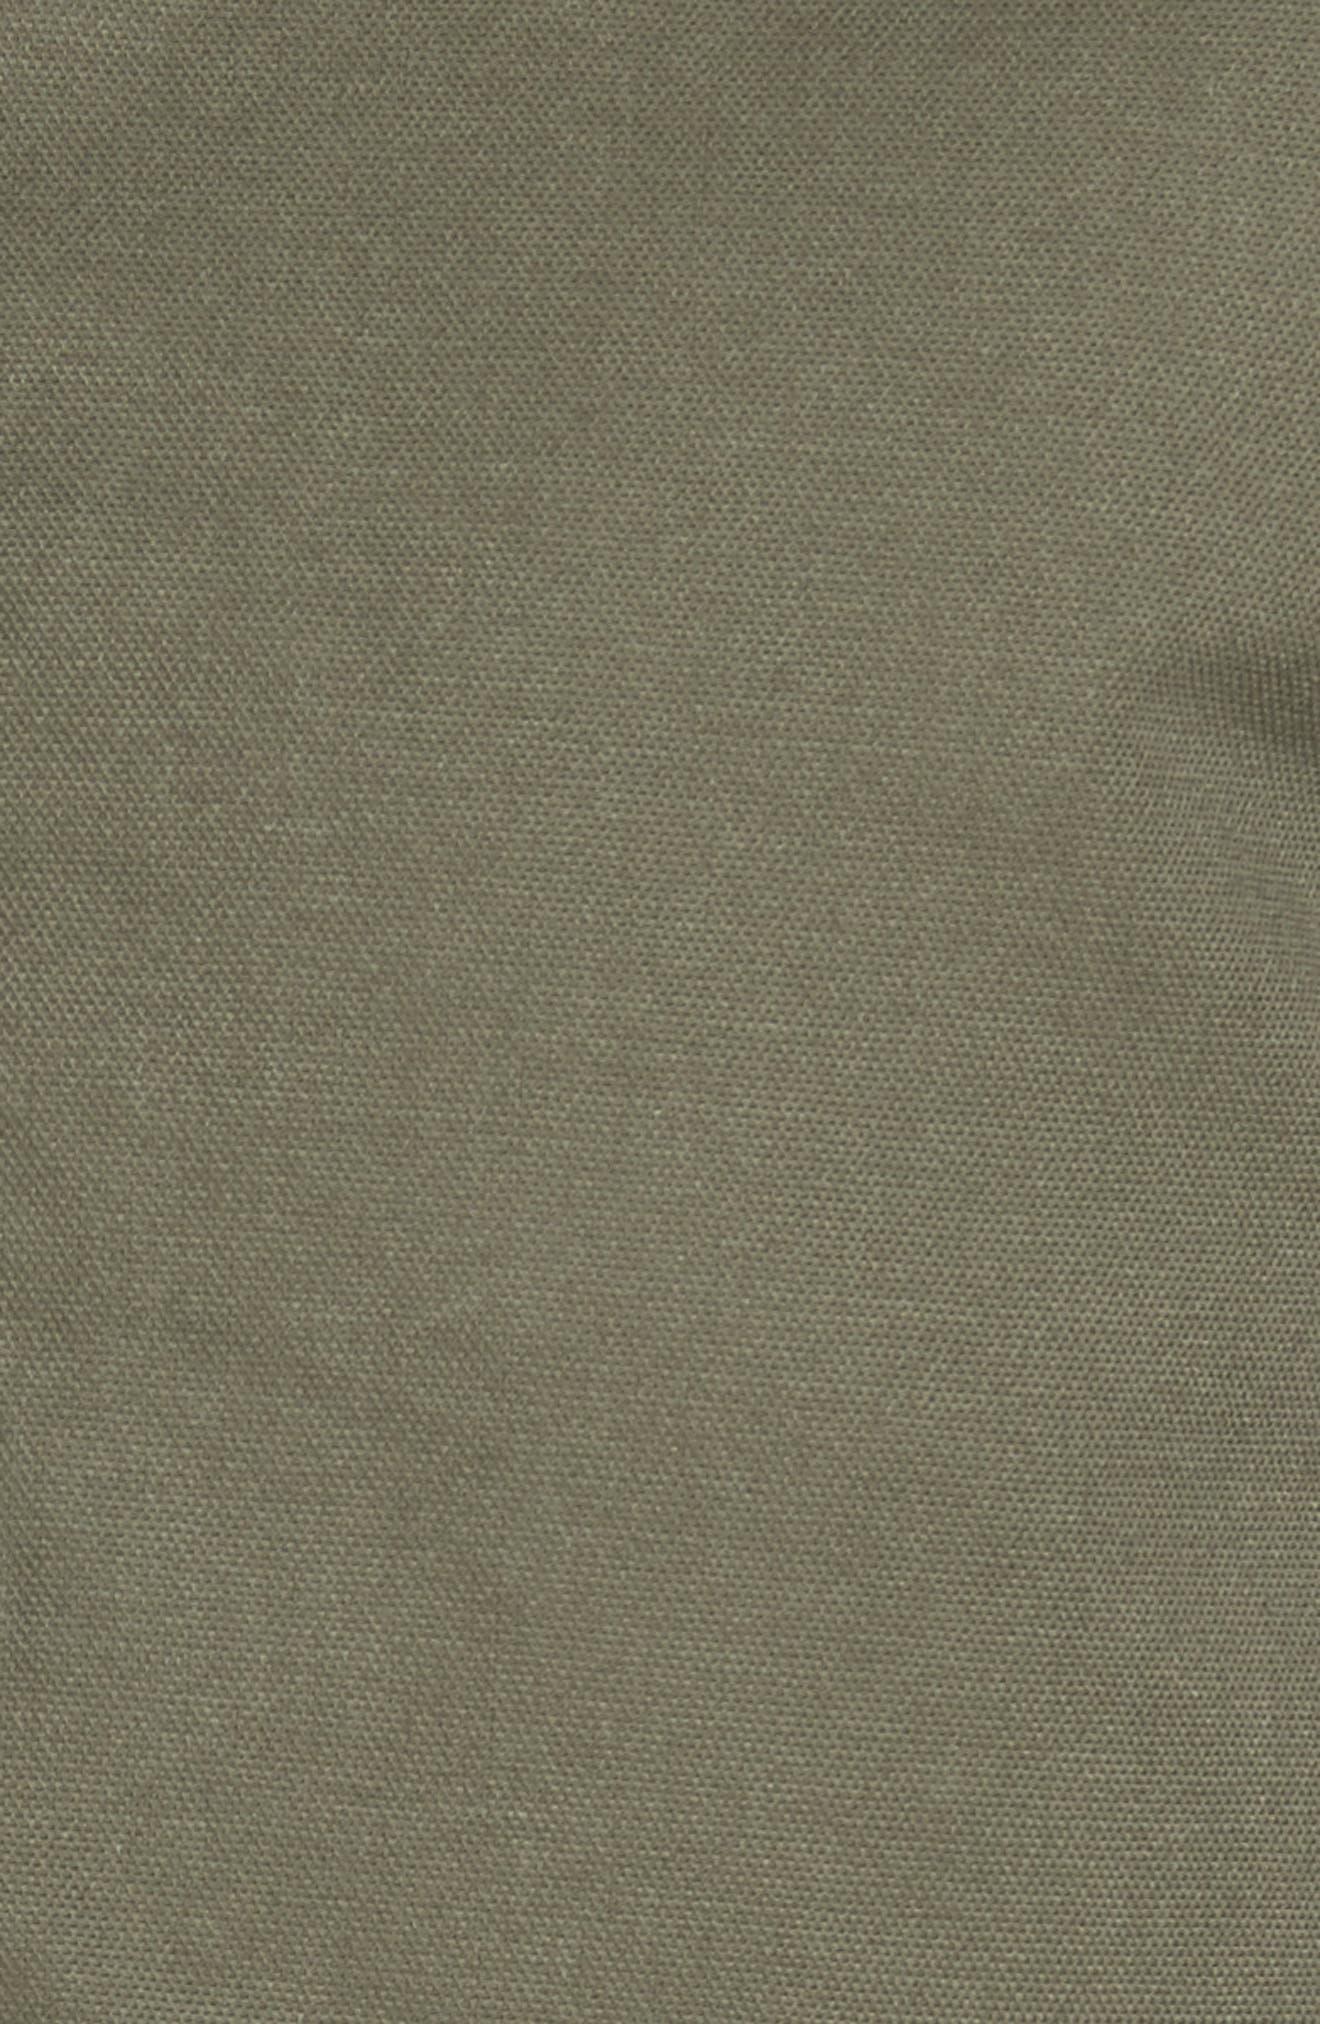 All City Bomber Jacket,                             Alternate thumbnail 6, color,                             340